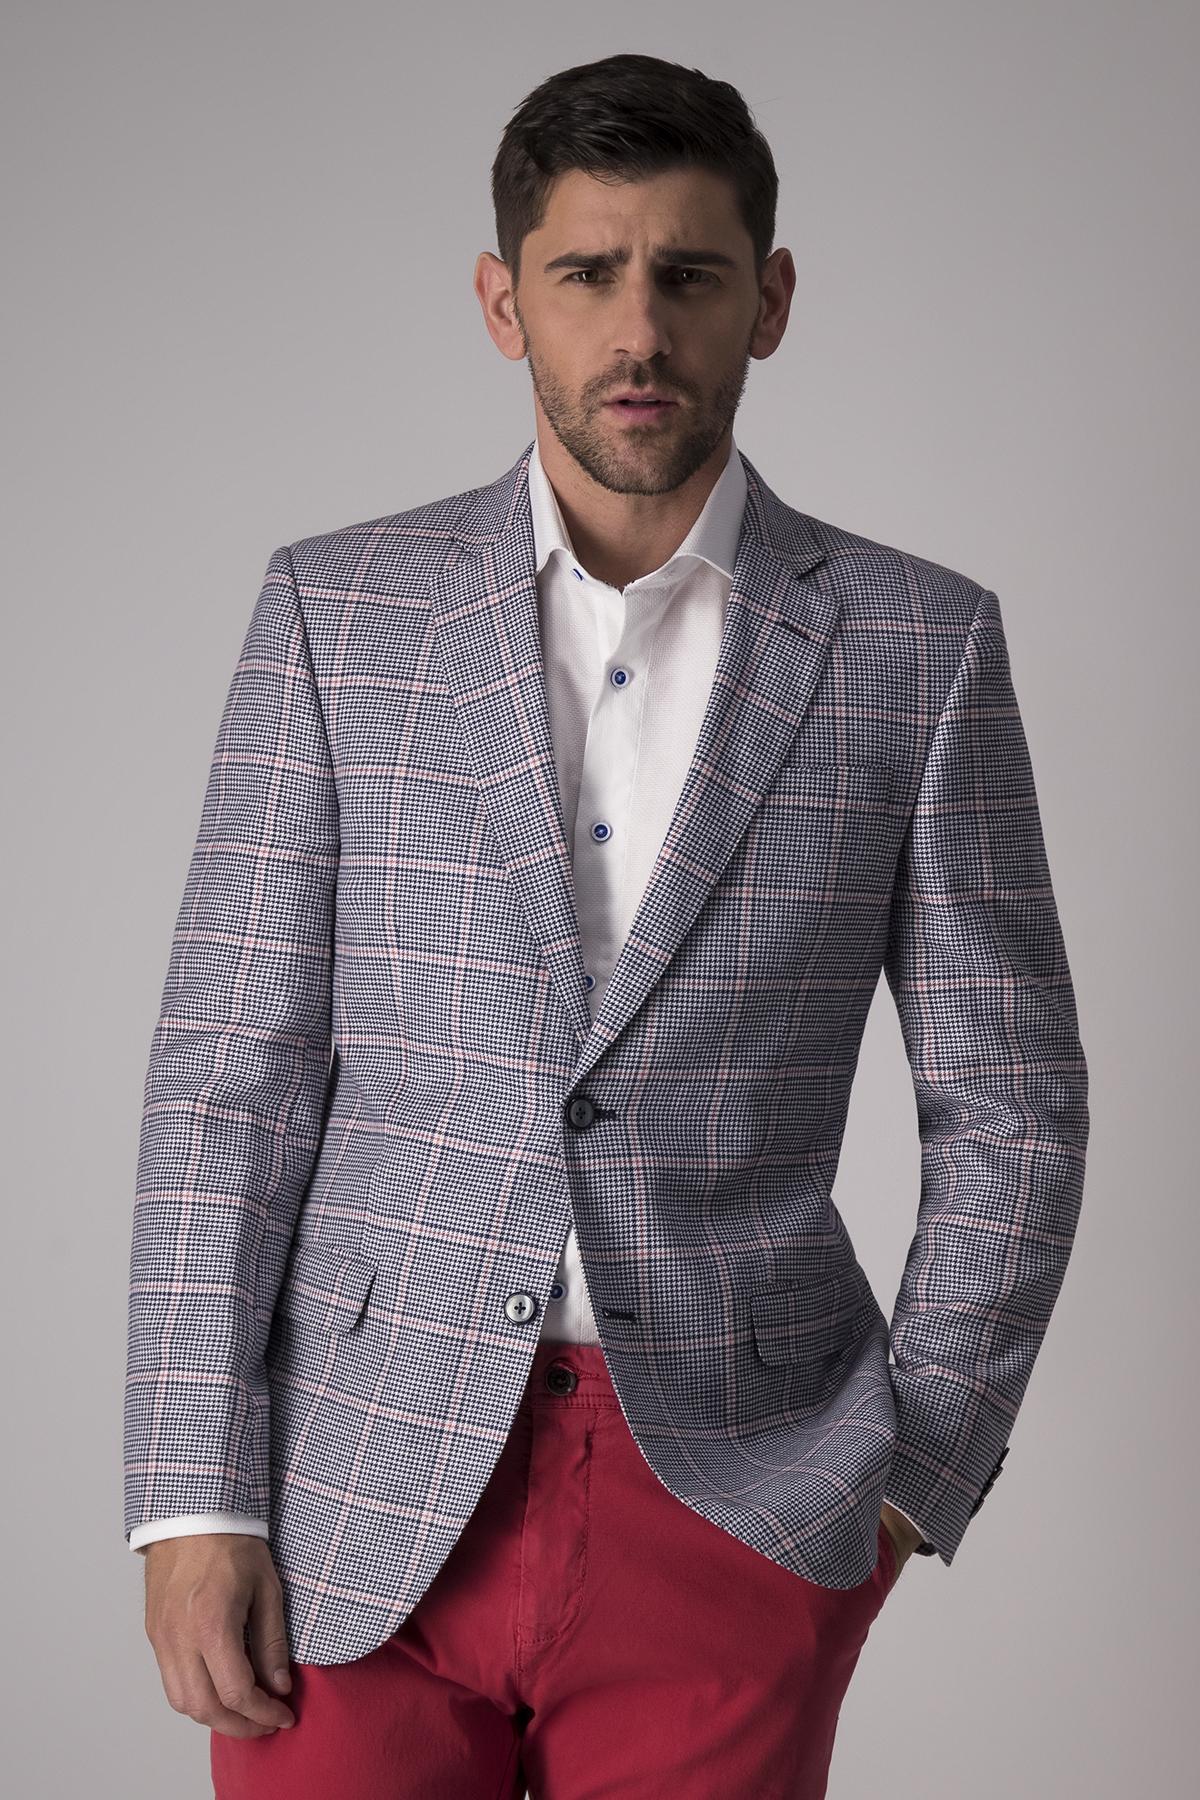 Blazer Robert´s  slim fit, lino mezcla, azul cuadros rosa.